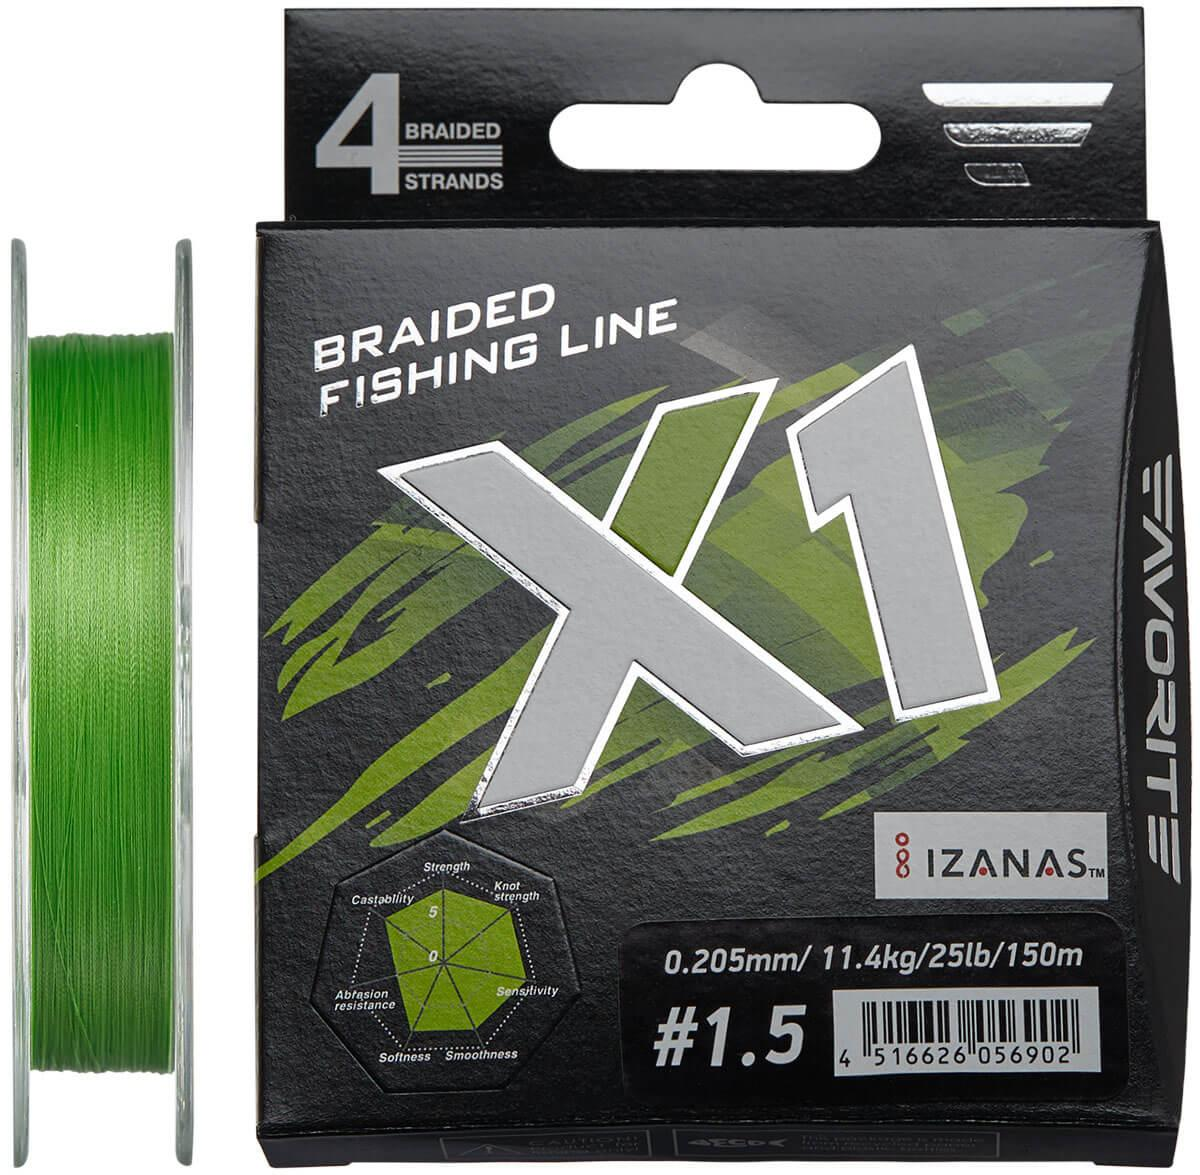 Шнур Favorite X1 PE 4x 150m (l.green) #1.5/0.205 mm 25lb/11.4 kg